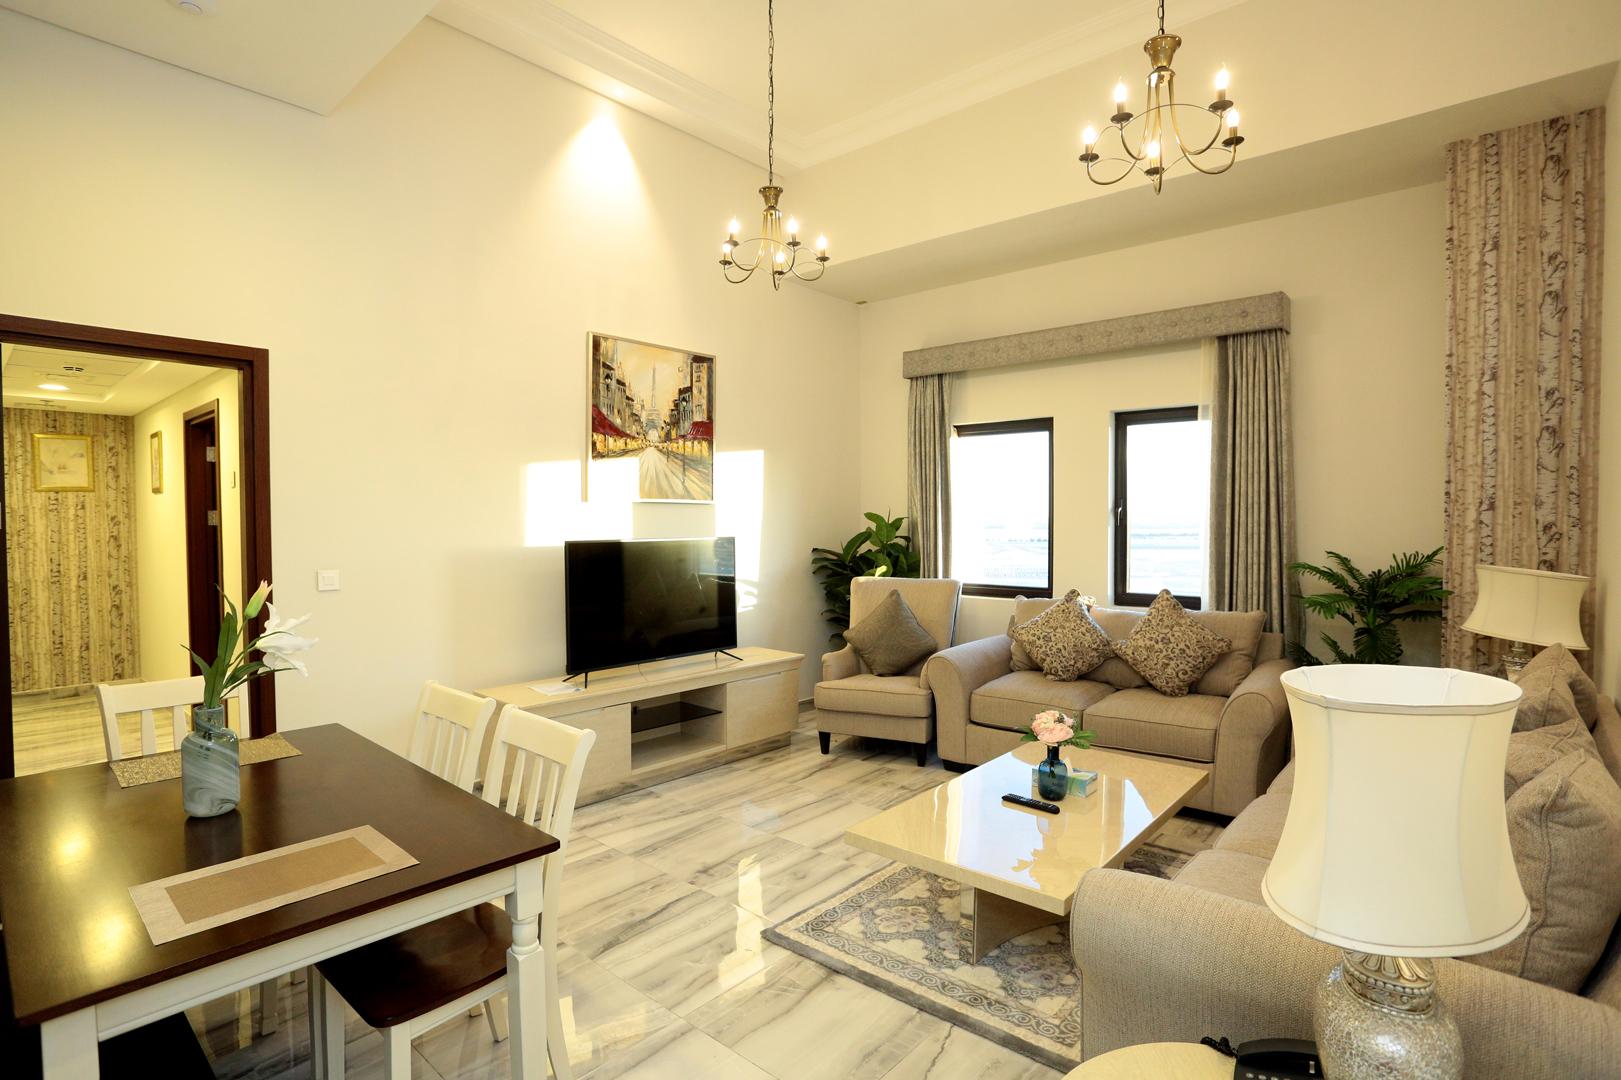 Apartment Marbella Luxury 2 bedrooms photo 27263086